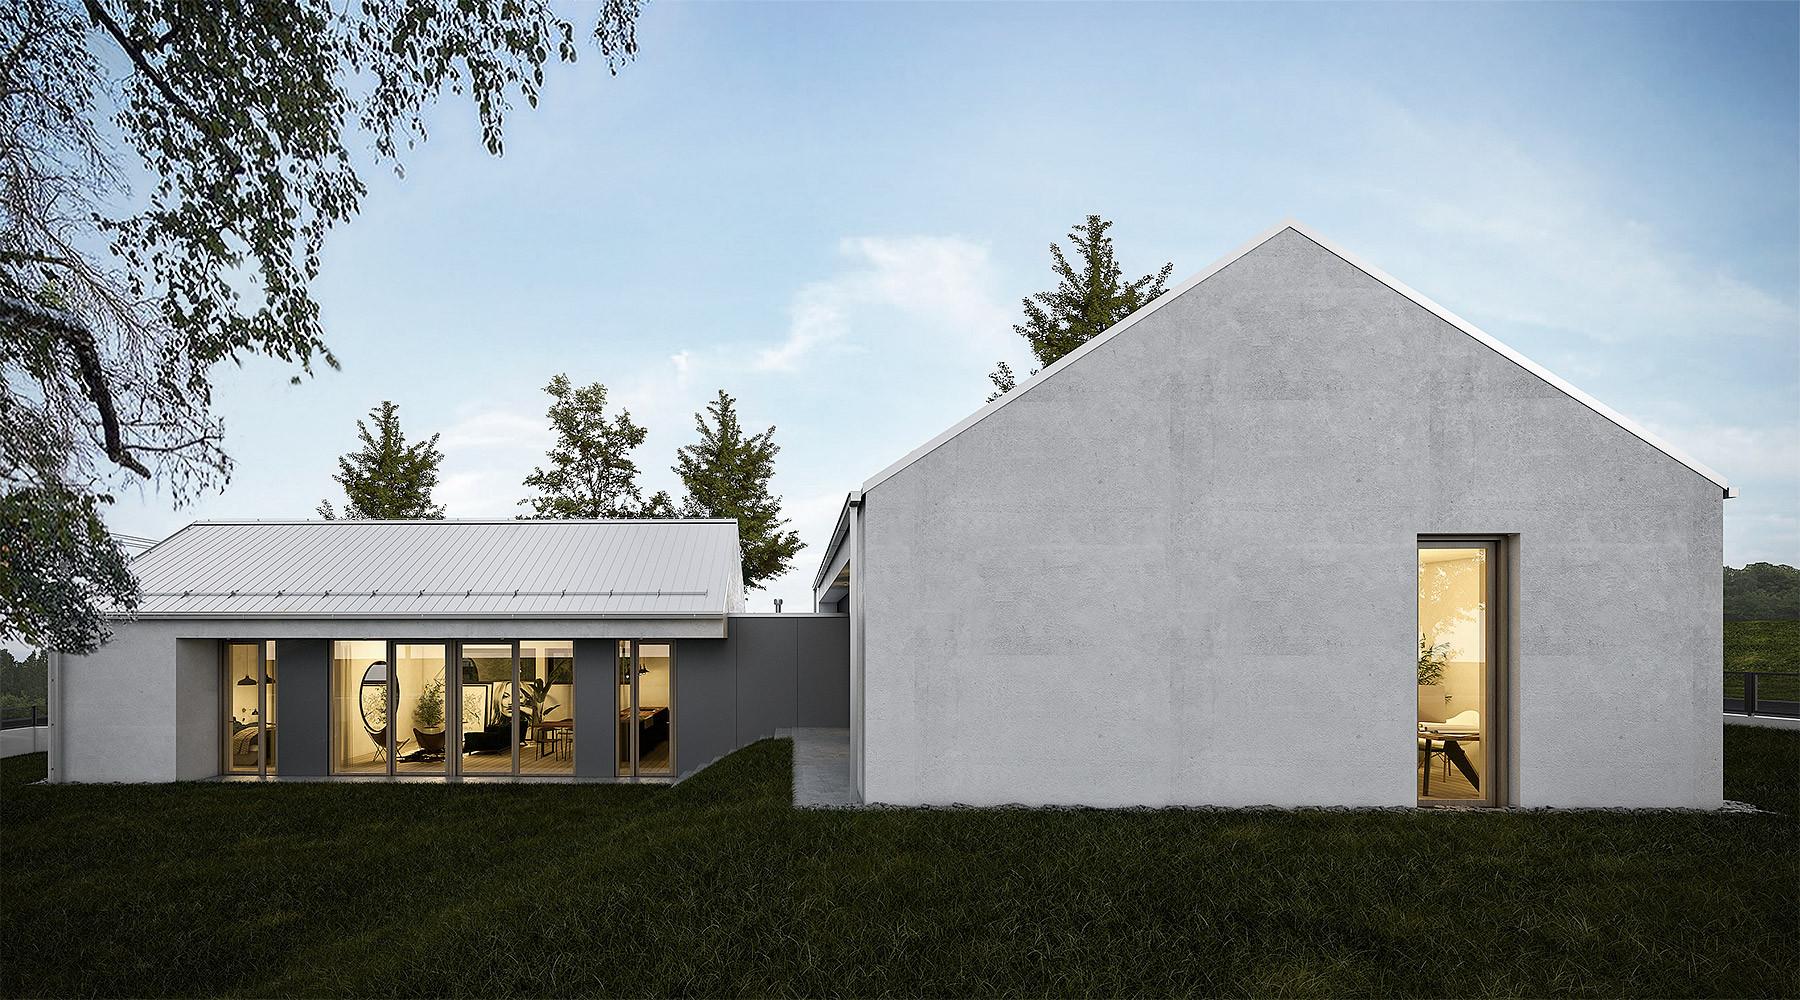 viceurovnova-moderni-vila-se-sikmou-strechou-dream-homes-plavec-front